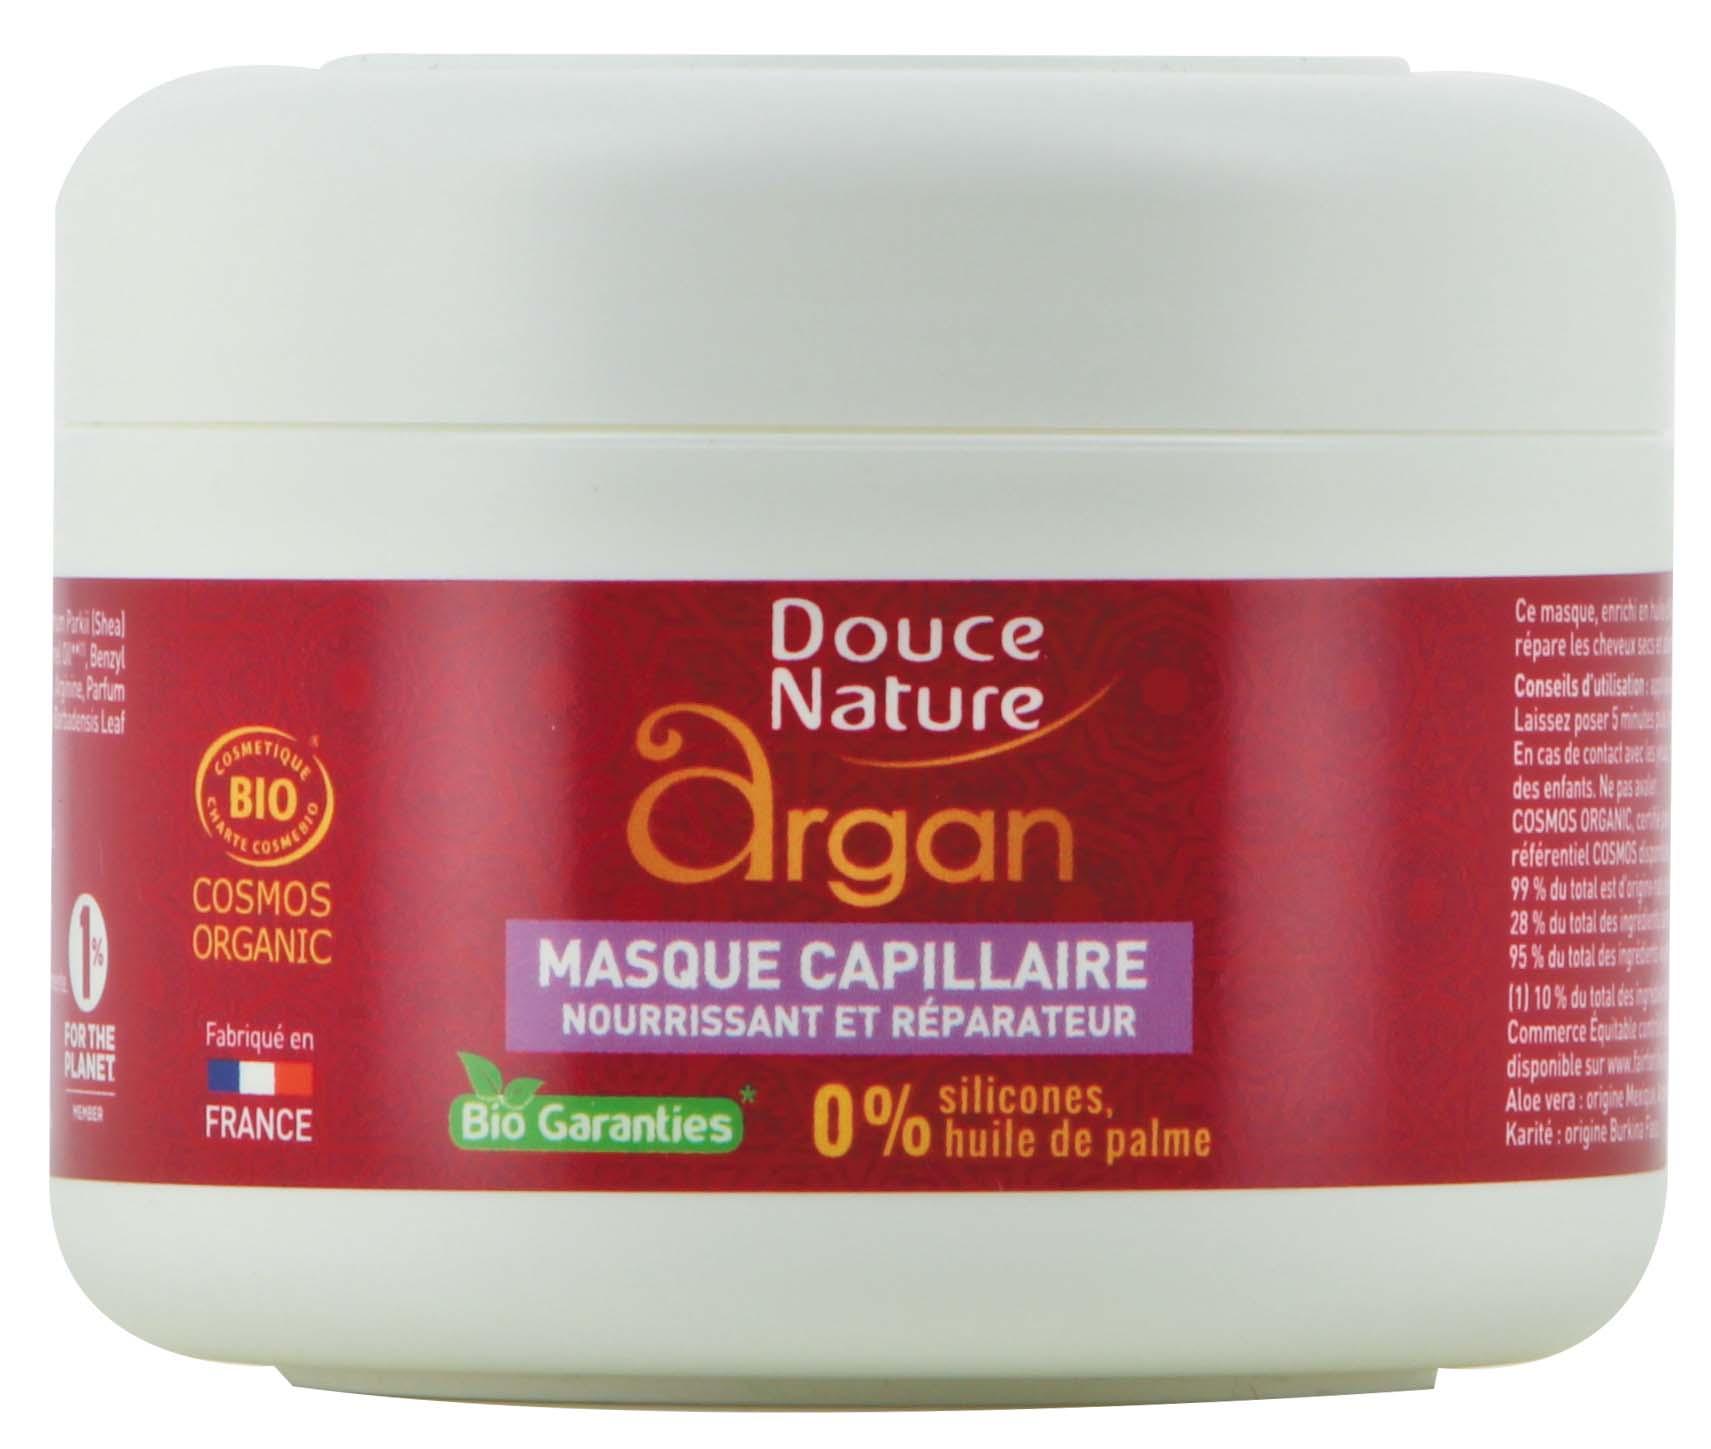 DOUCE NATURE ARGAN Masque Capillaire - 200 ml